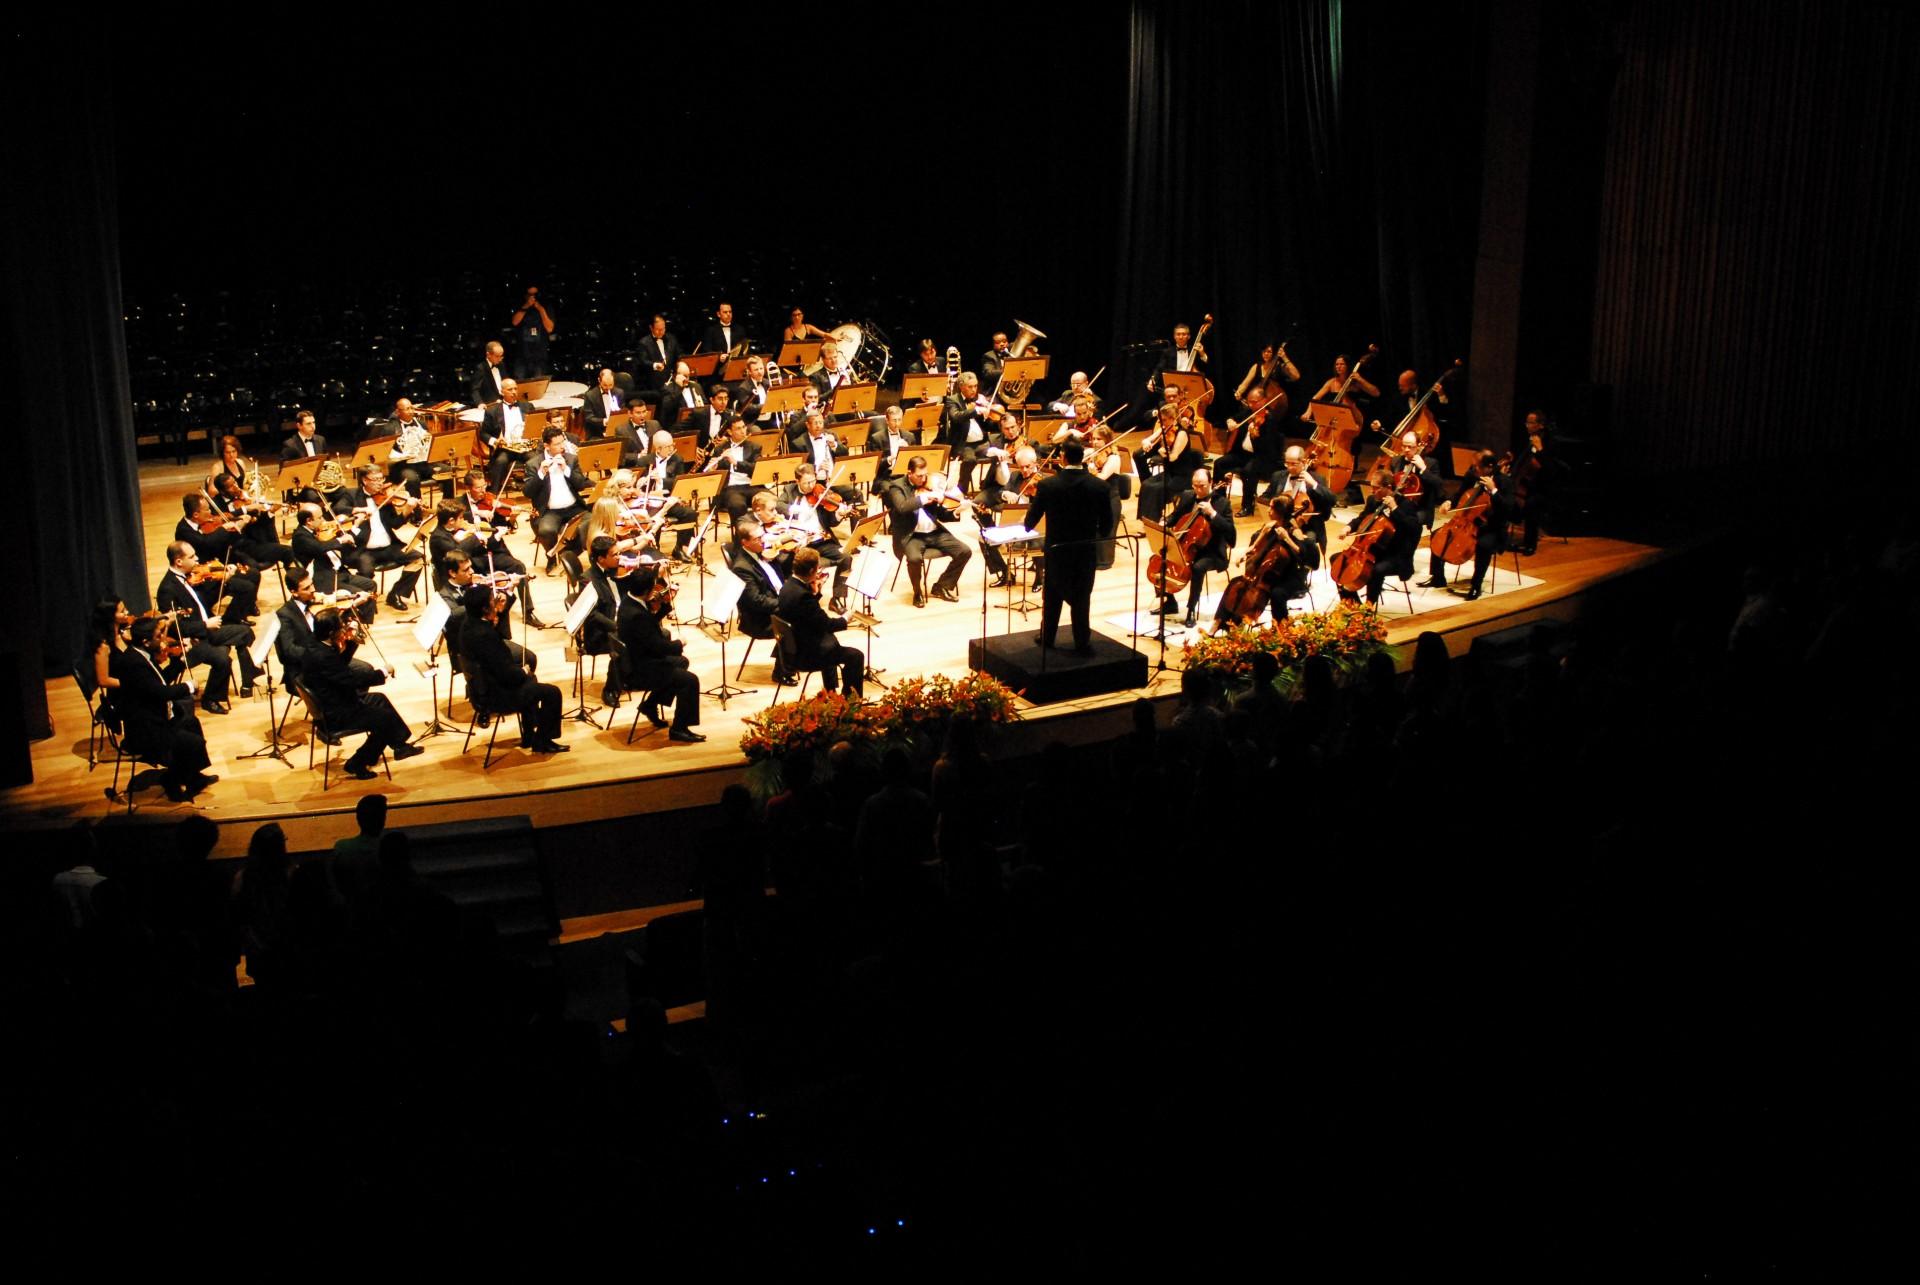 orquestra_sinfonica_de_campinas-298584